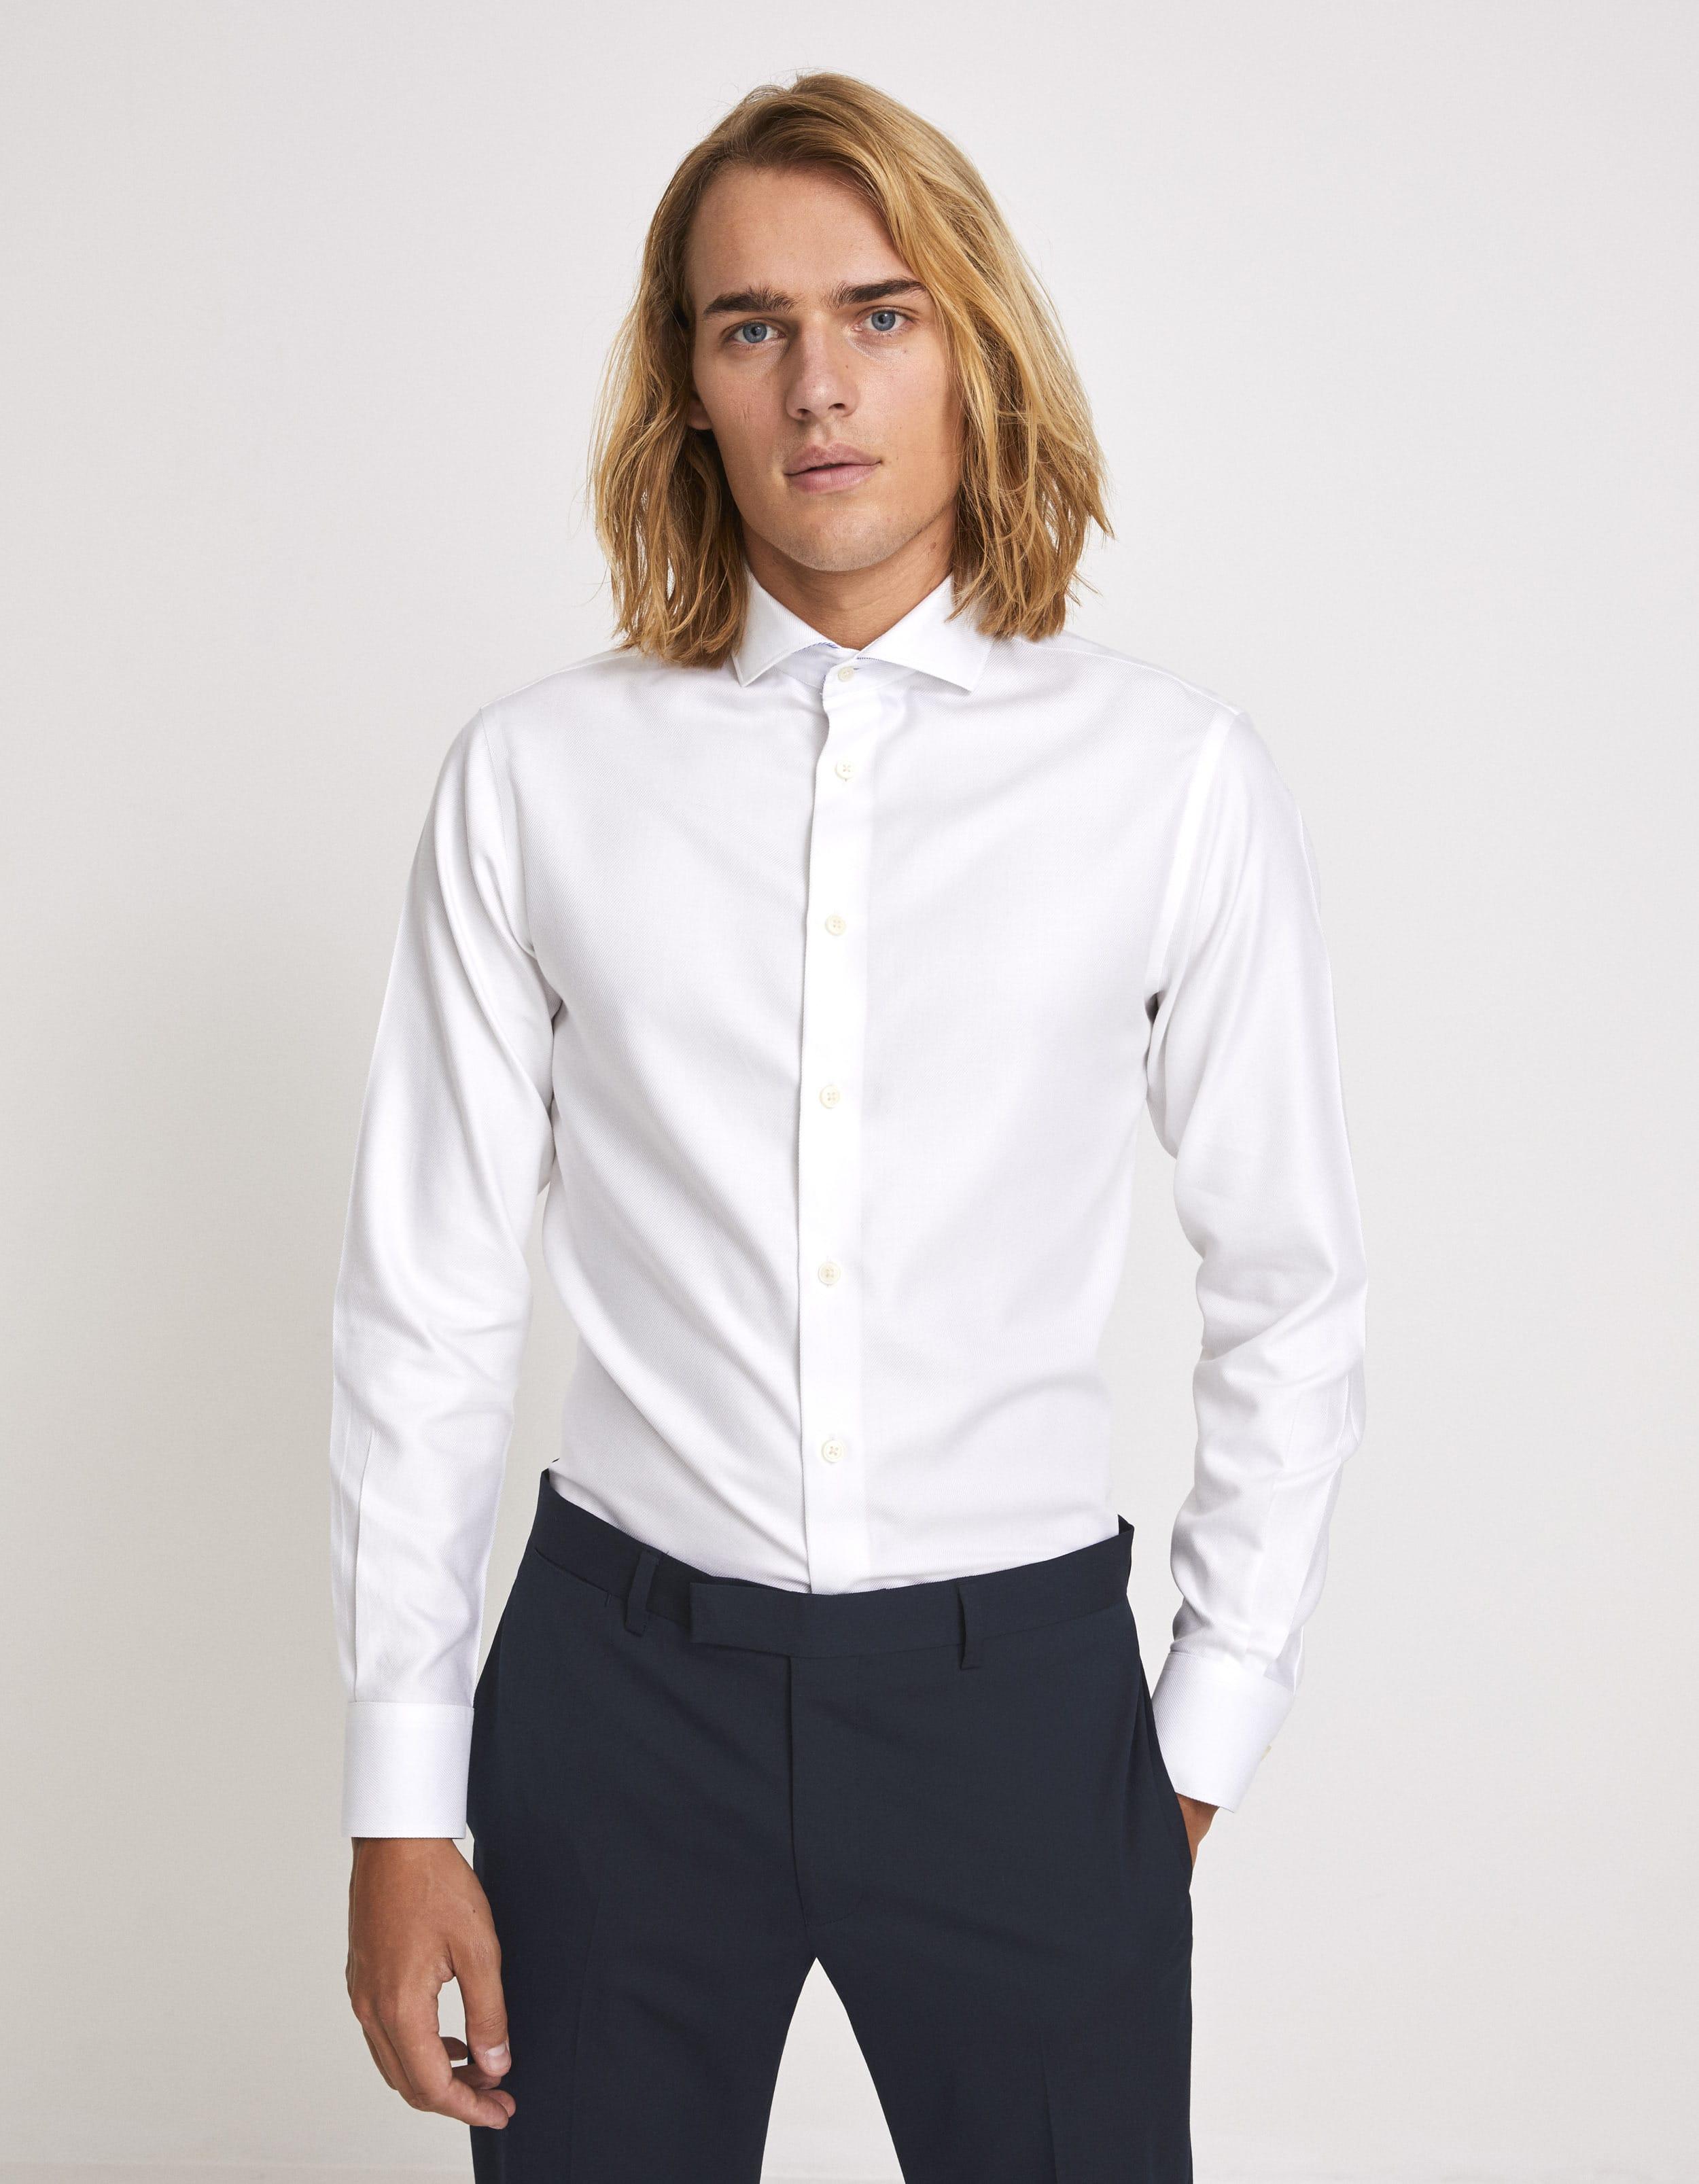 chemise slim sans repassage Prix 59,99 €